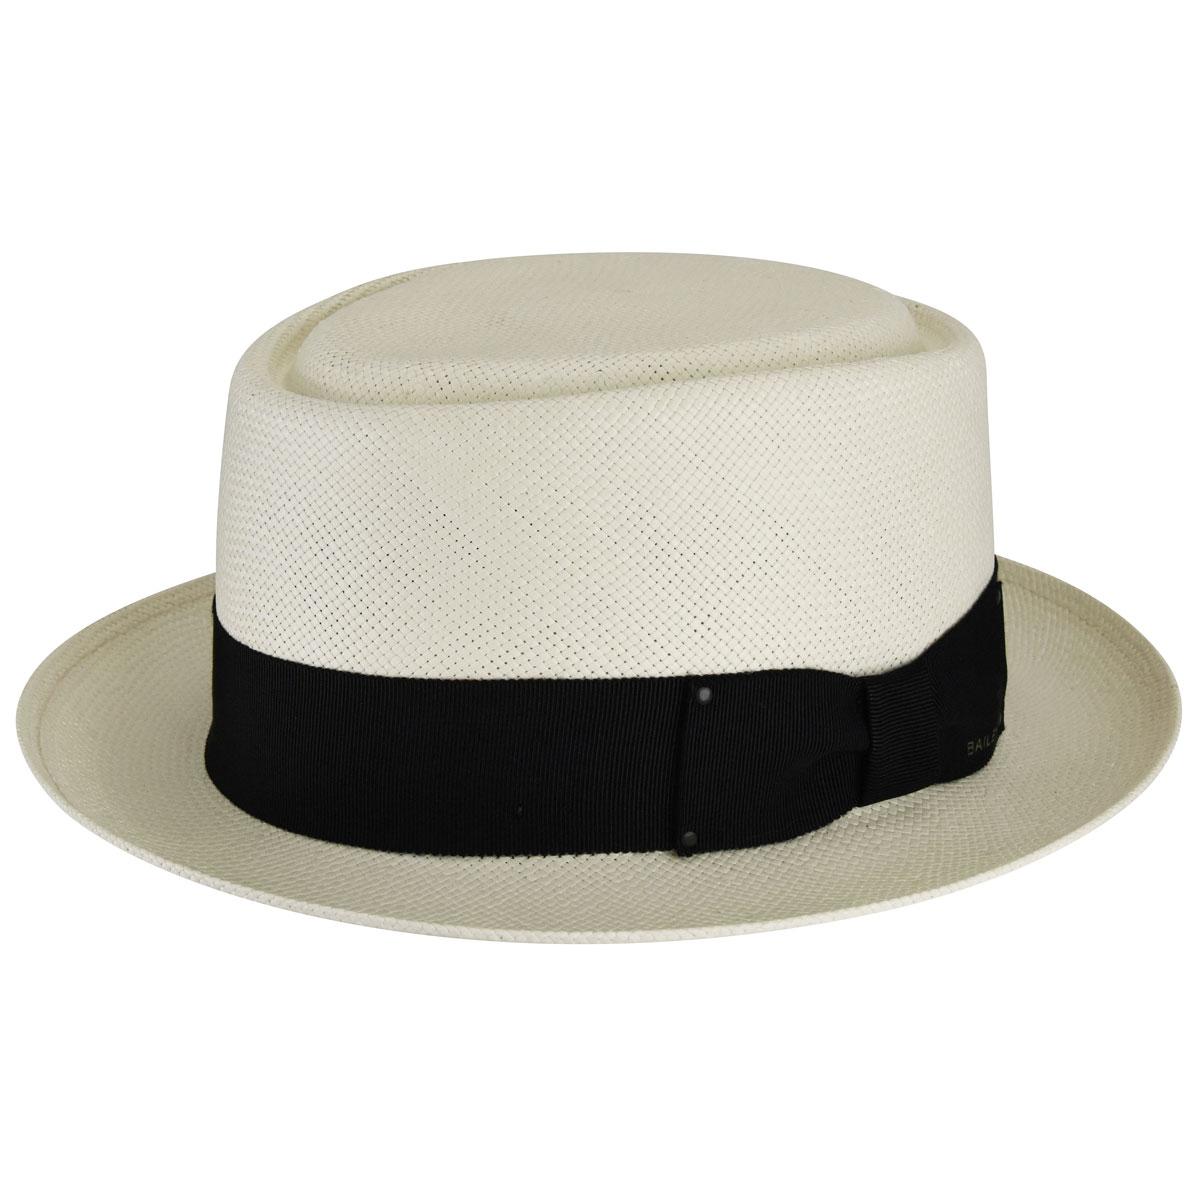 Men's Swing Dance Clothing to Keep You Cool Larkin LiteStrawreg Pork Pie $150.00 AT vintagedancer.com